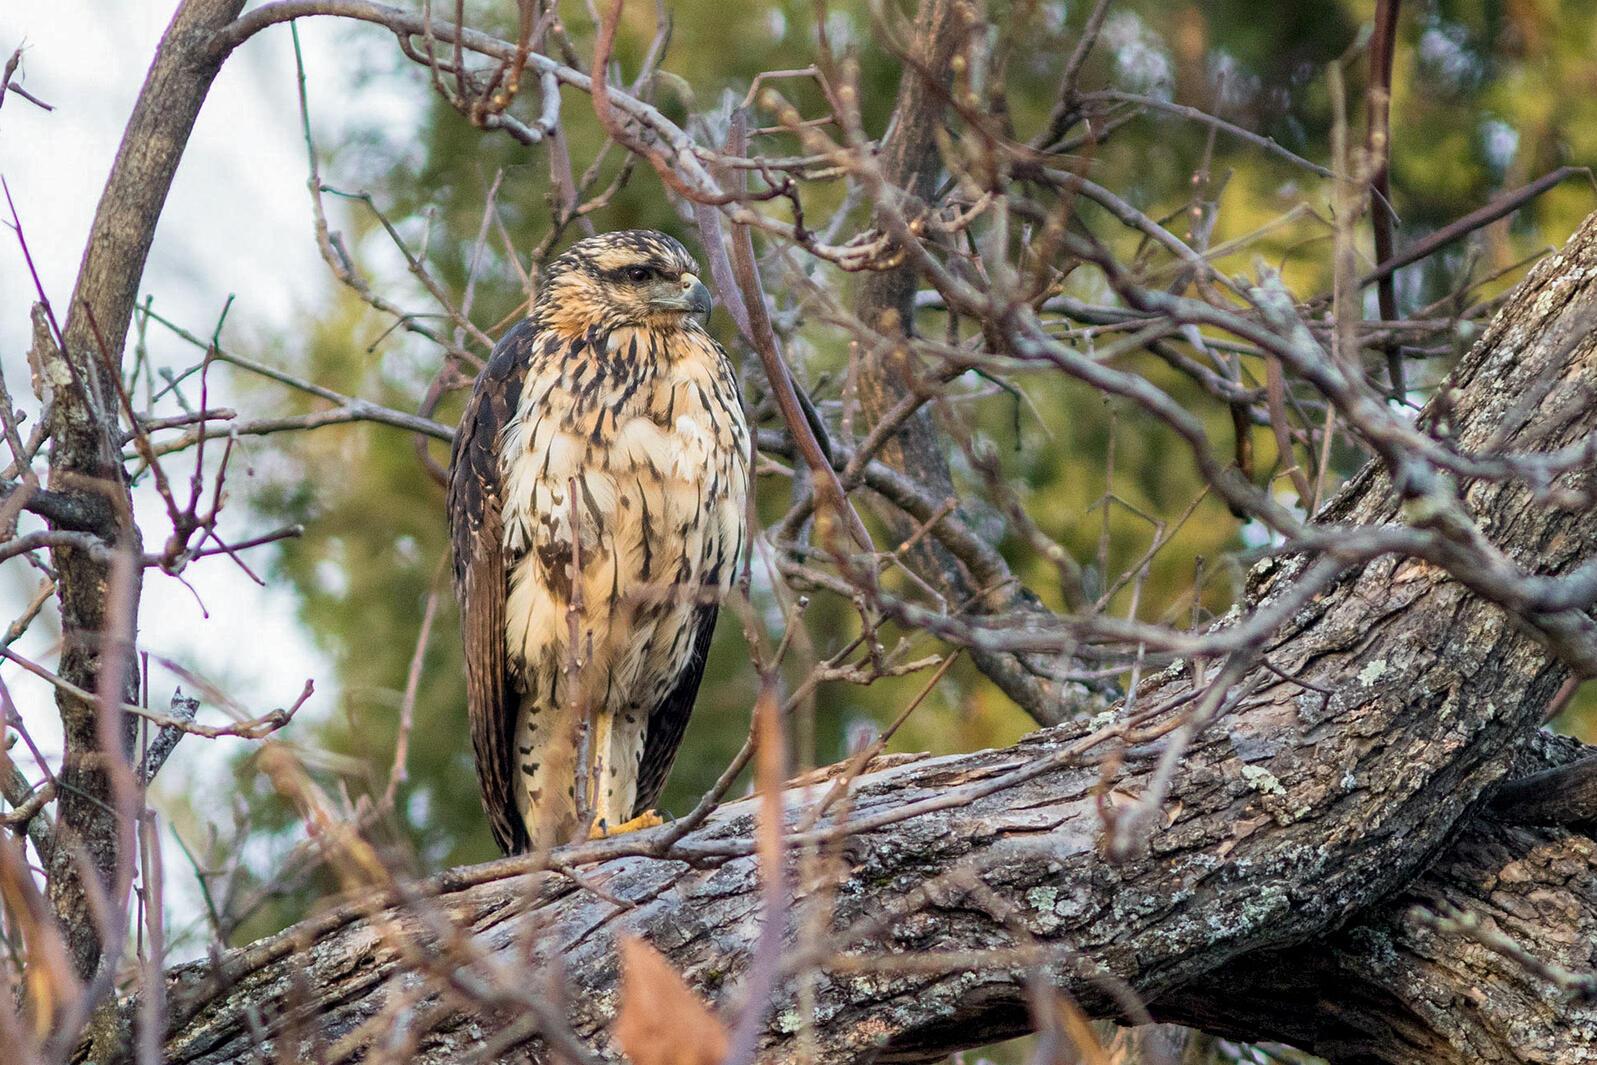 Great Black Hawk in Maine. Doug Hitchcox/Maine Audubon